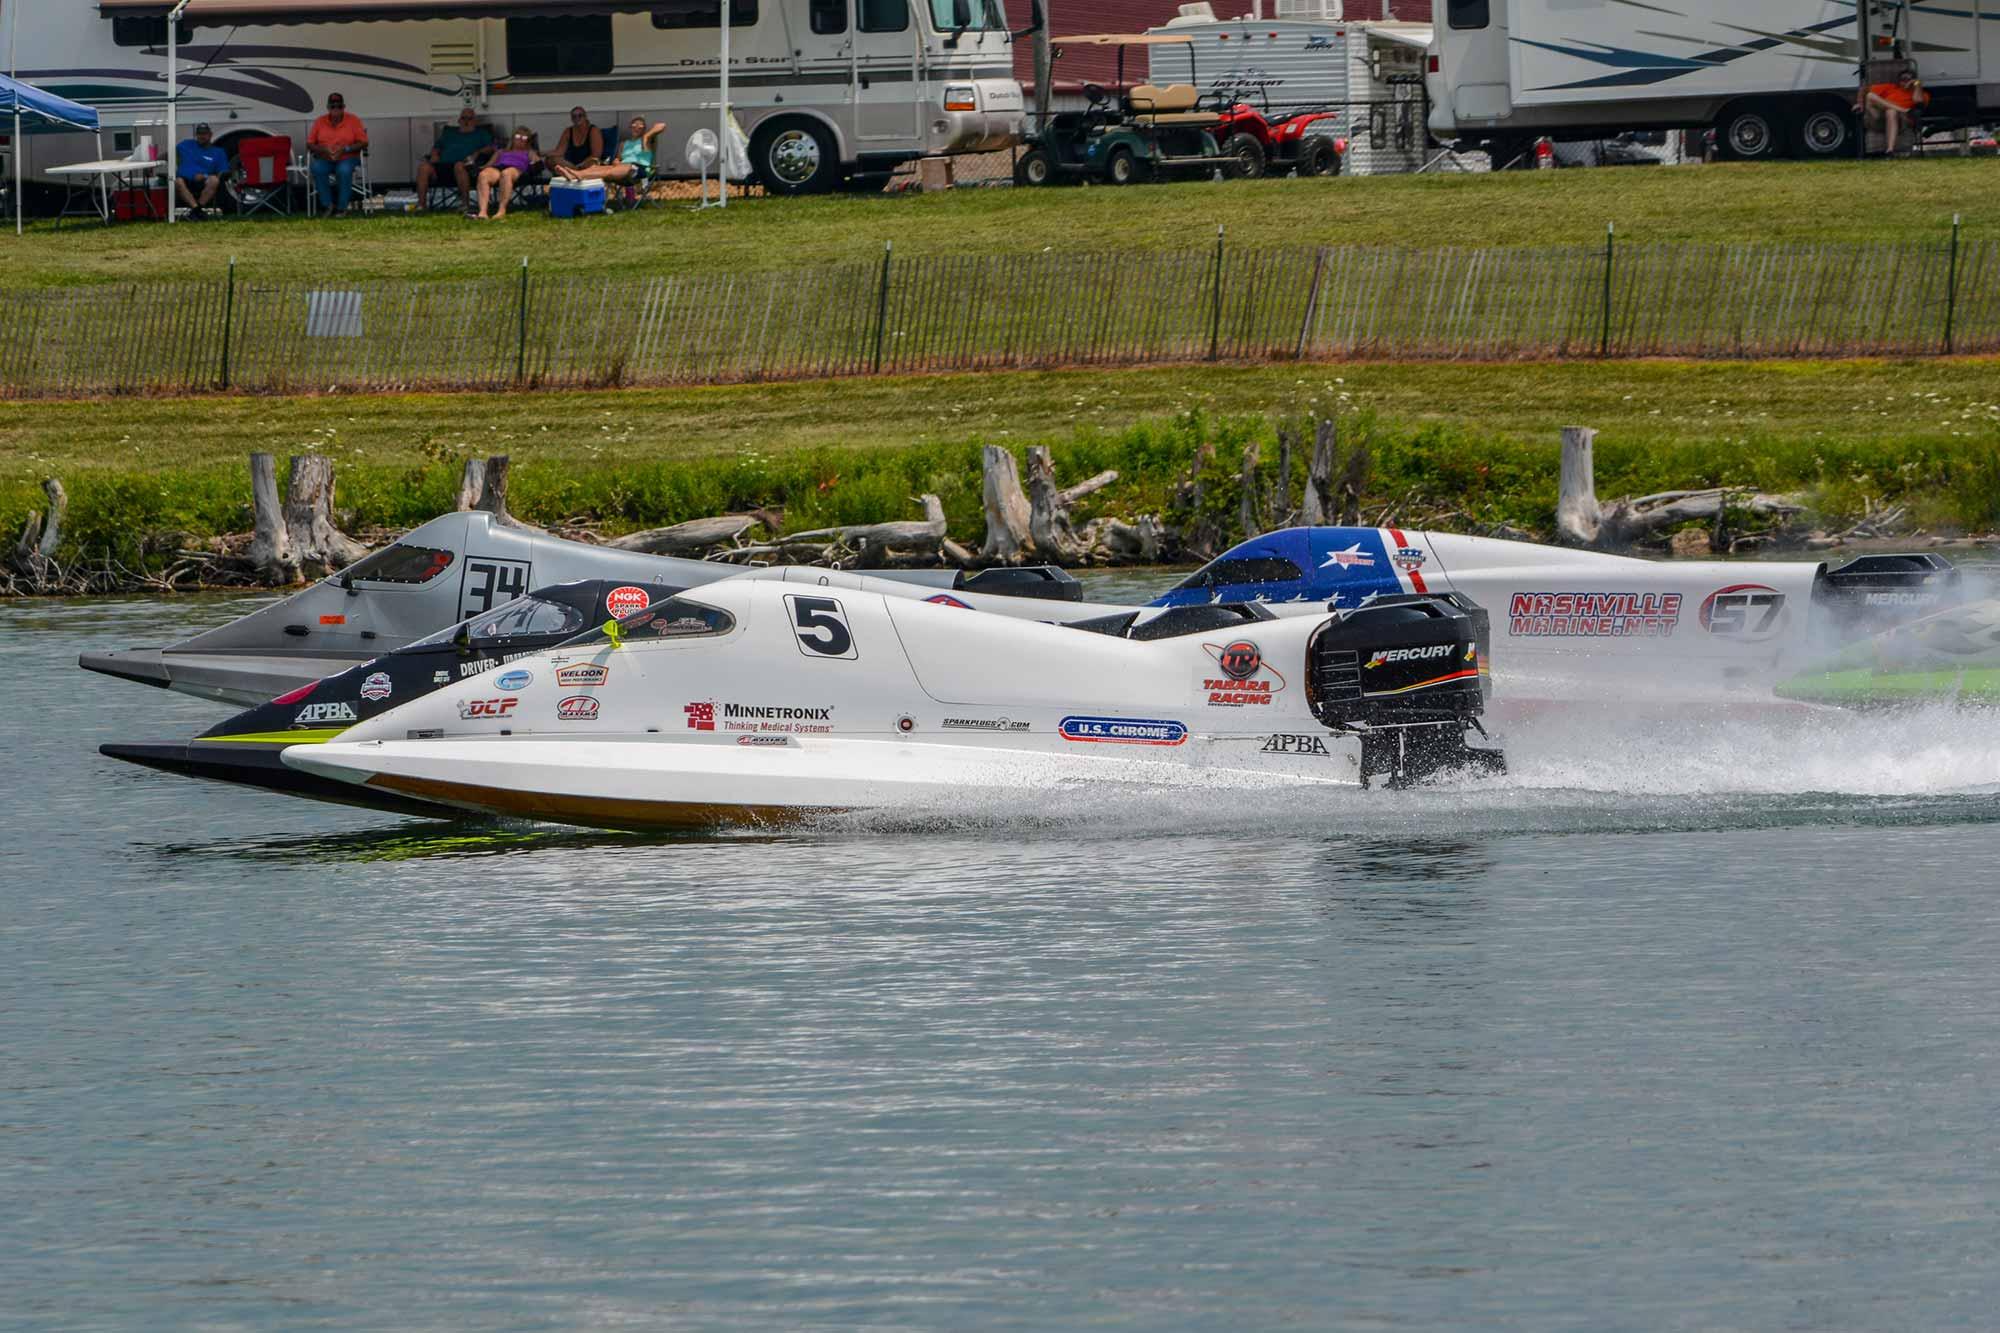 McMurray-Racing-Nashvill-Marine-2021-Springfield-F1-Race-2